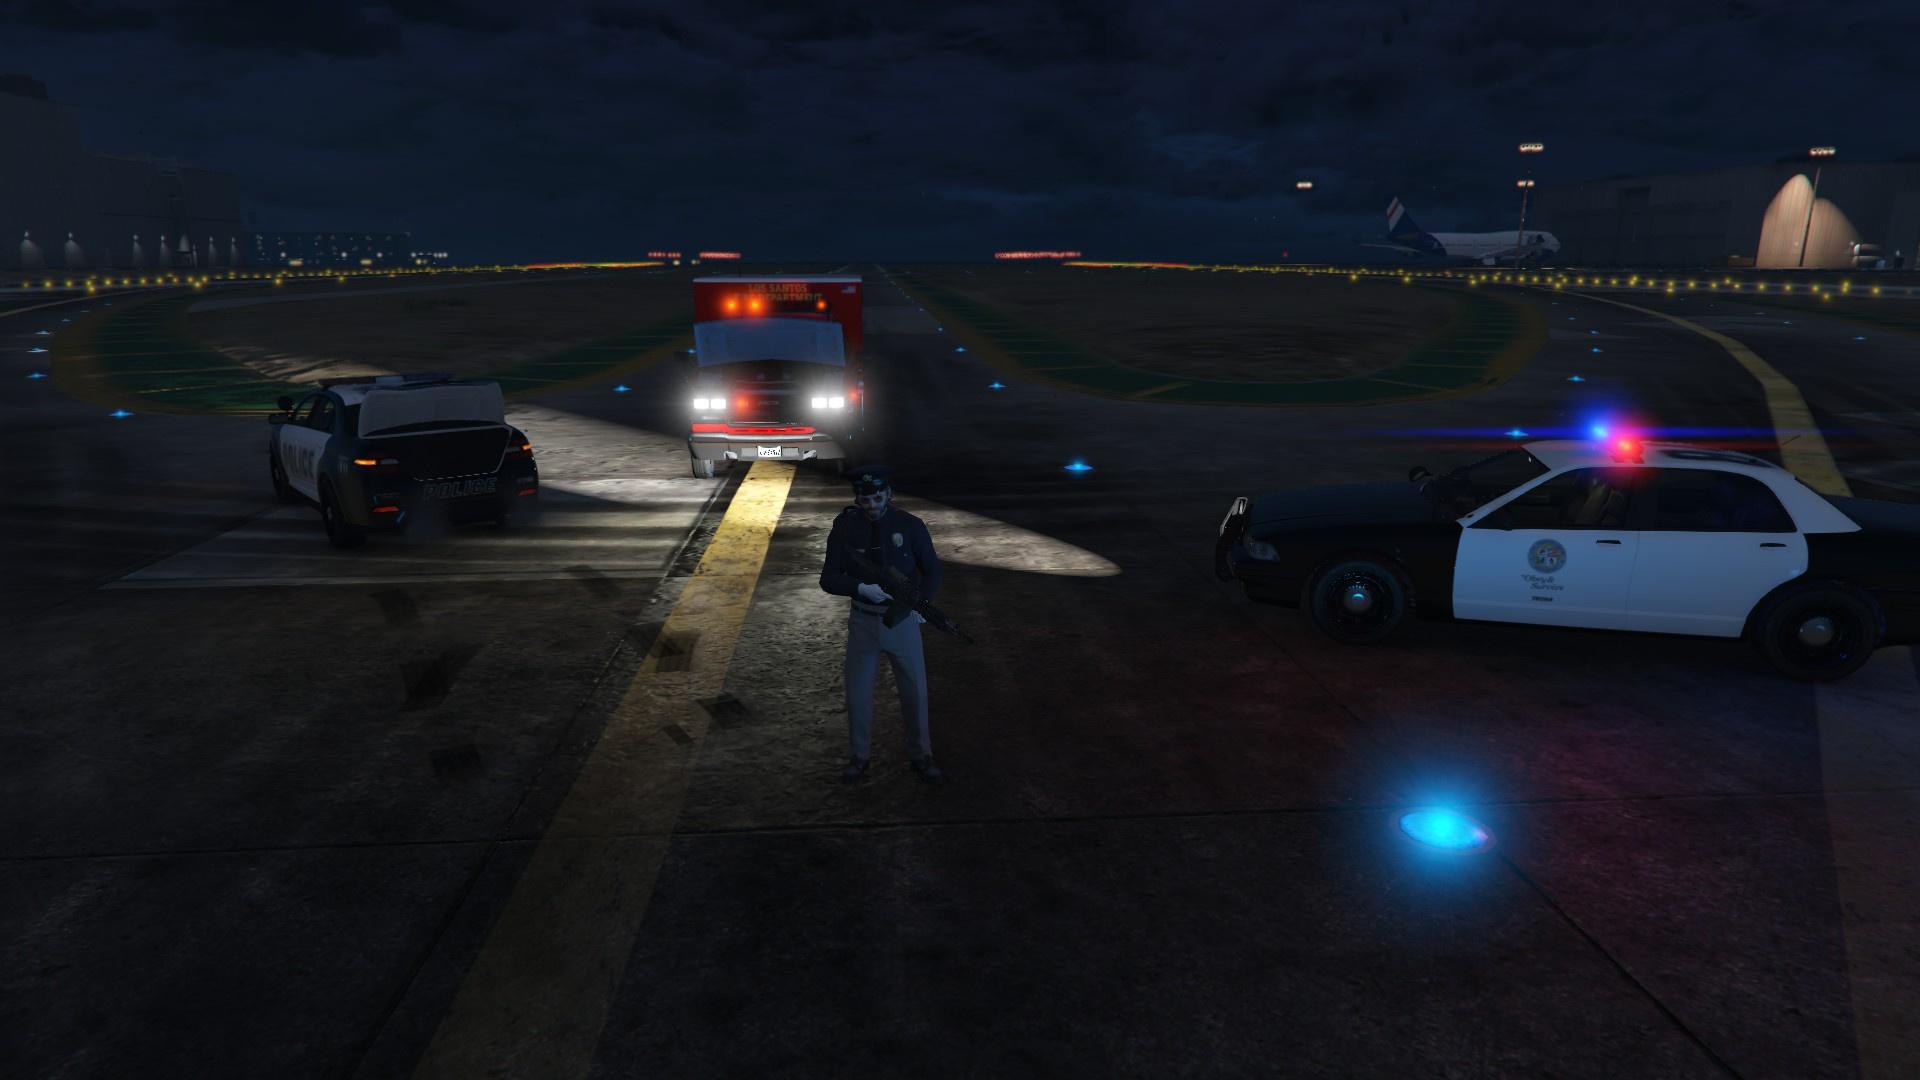 Vehicle Controller (Lights, Engine, Doors, Cruise, Speedometer